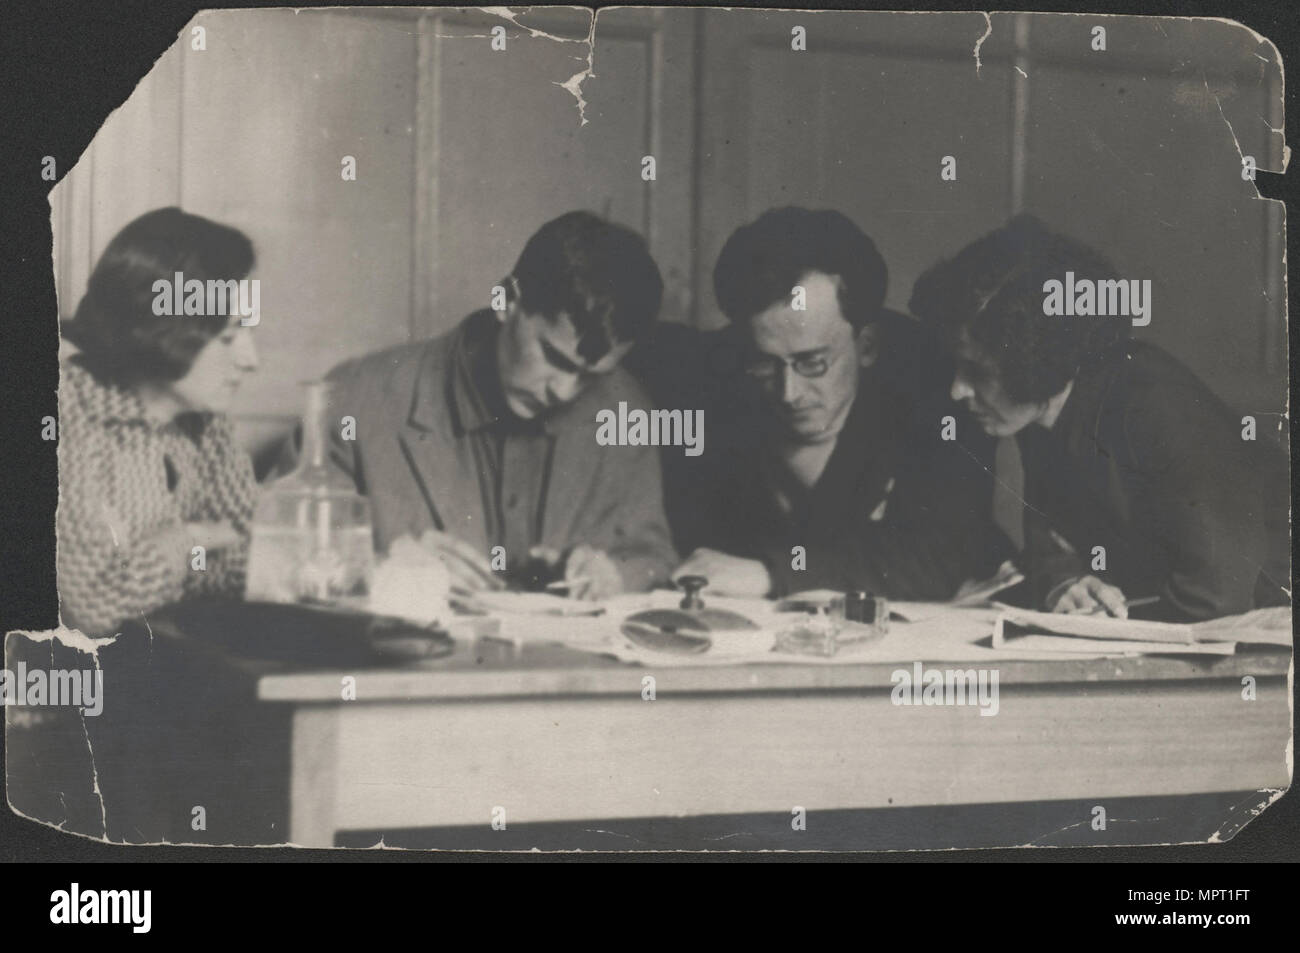 Varlam Shalamov and Arkady Shumsky at the editorial office Za udarnichestvo, 1932. - Stock Image